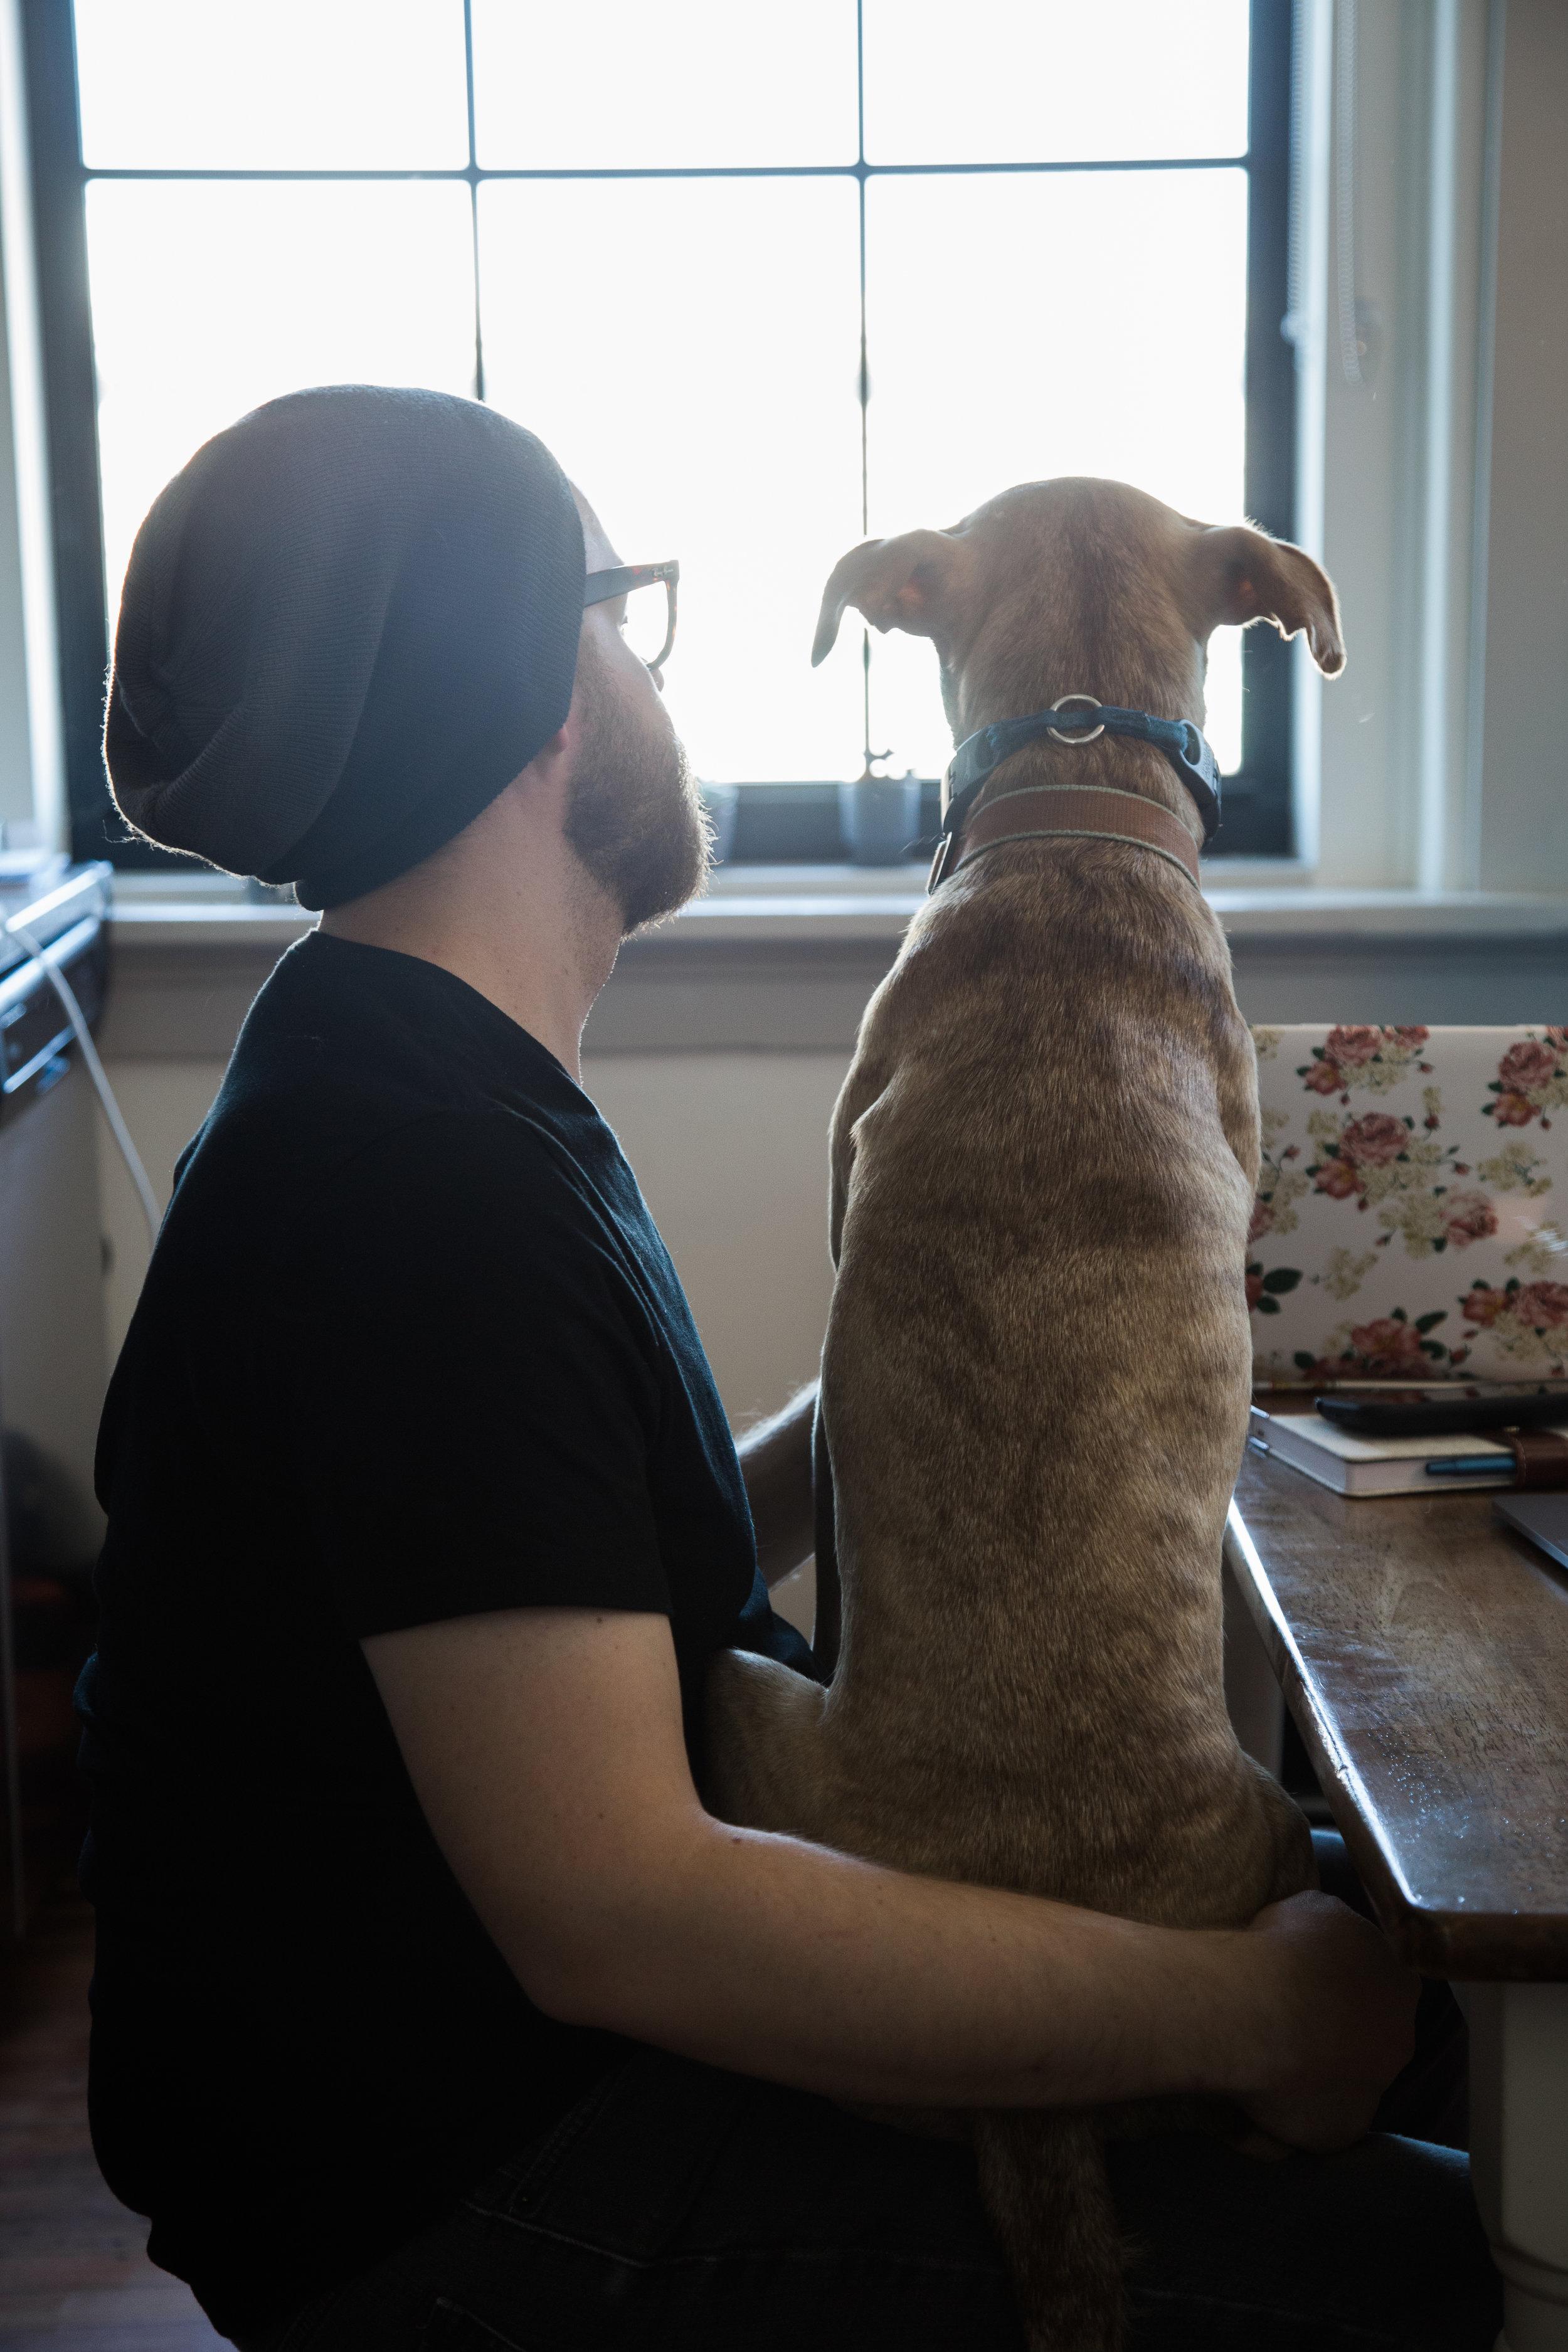 Zach with kobe, the Ästhetik design mascot dog